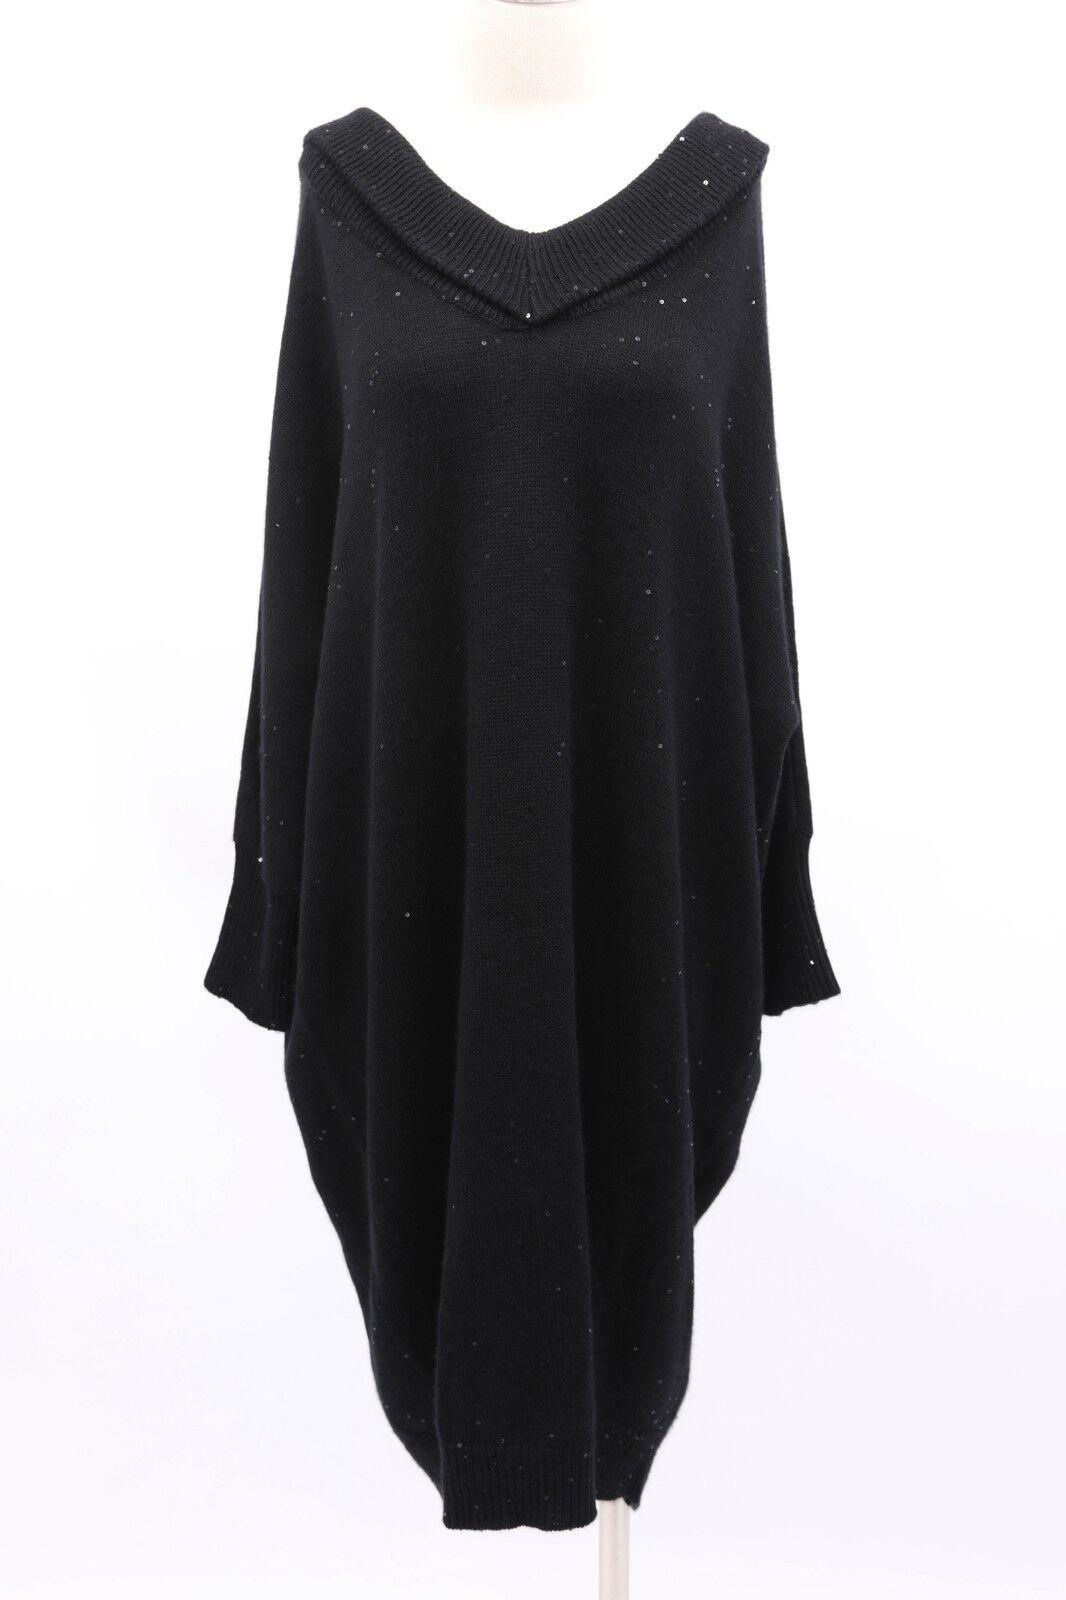 5fa1fa1649 NWT Brunello Cucinelli Cashmere-Silk Sparkly Sequined Knit Dress Sz M A181